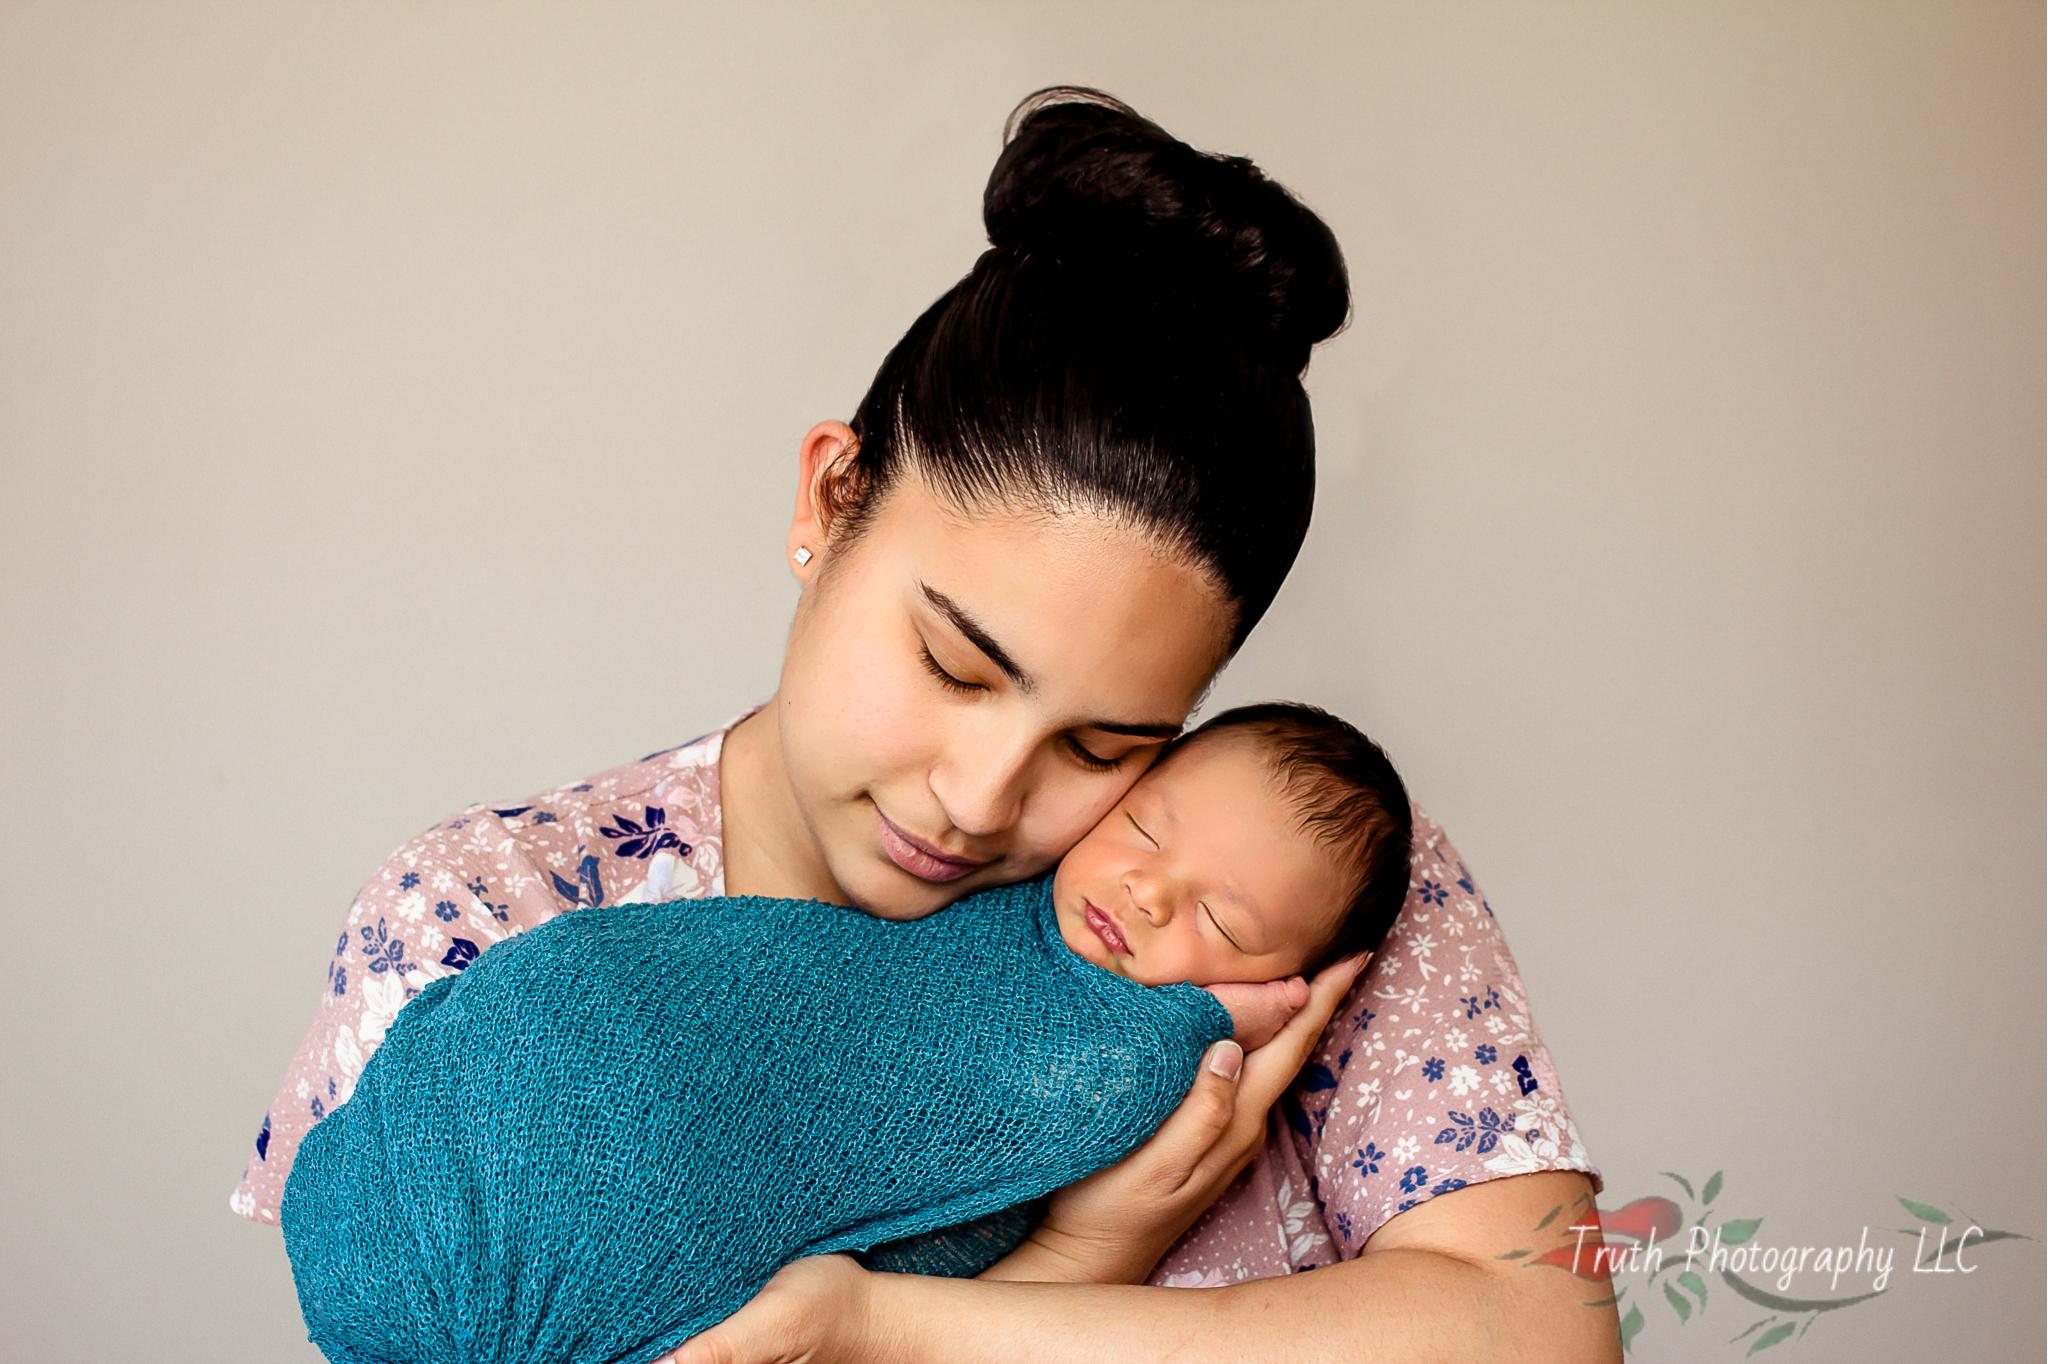 Truth-Photography-Broomfield-newborn-photo.jpg